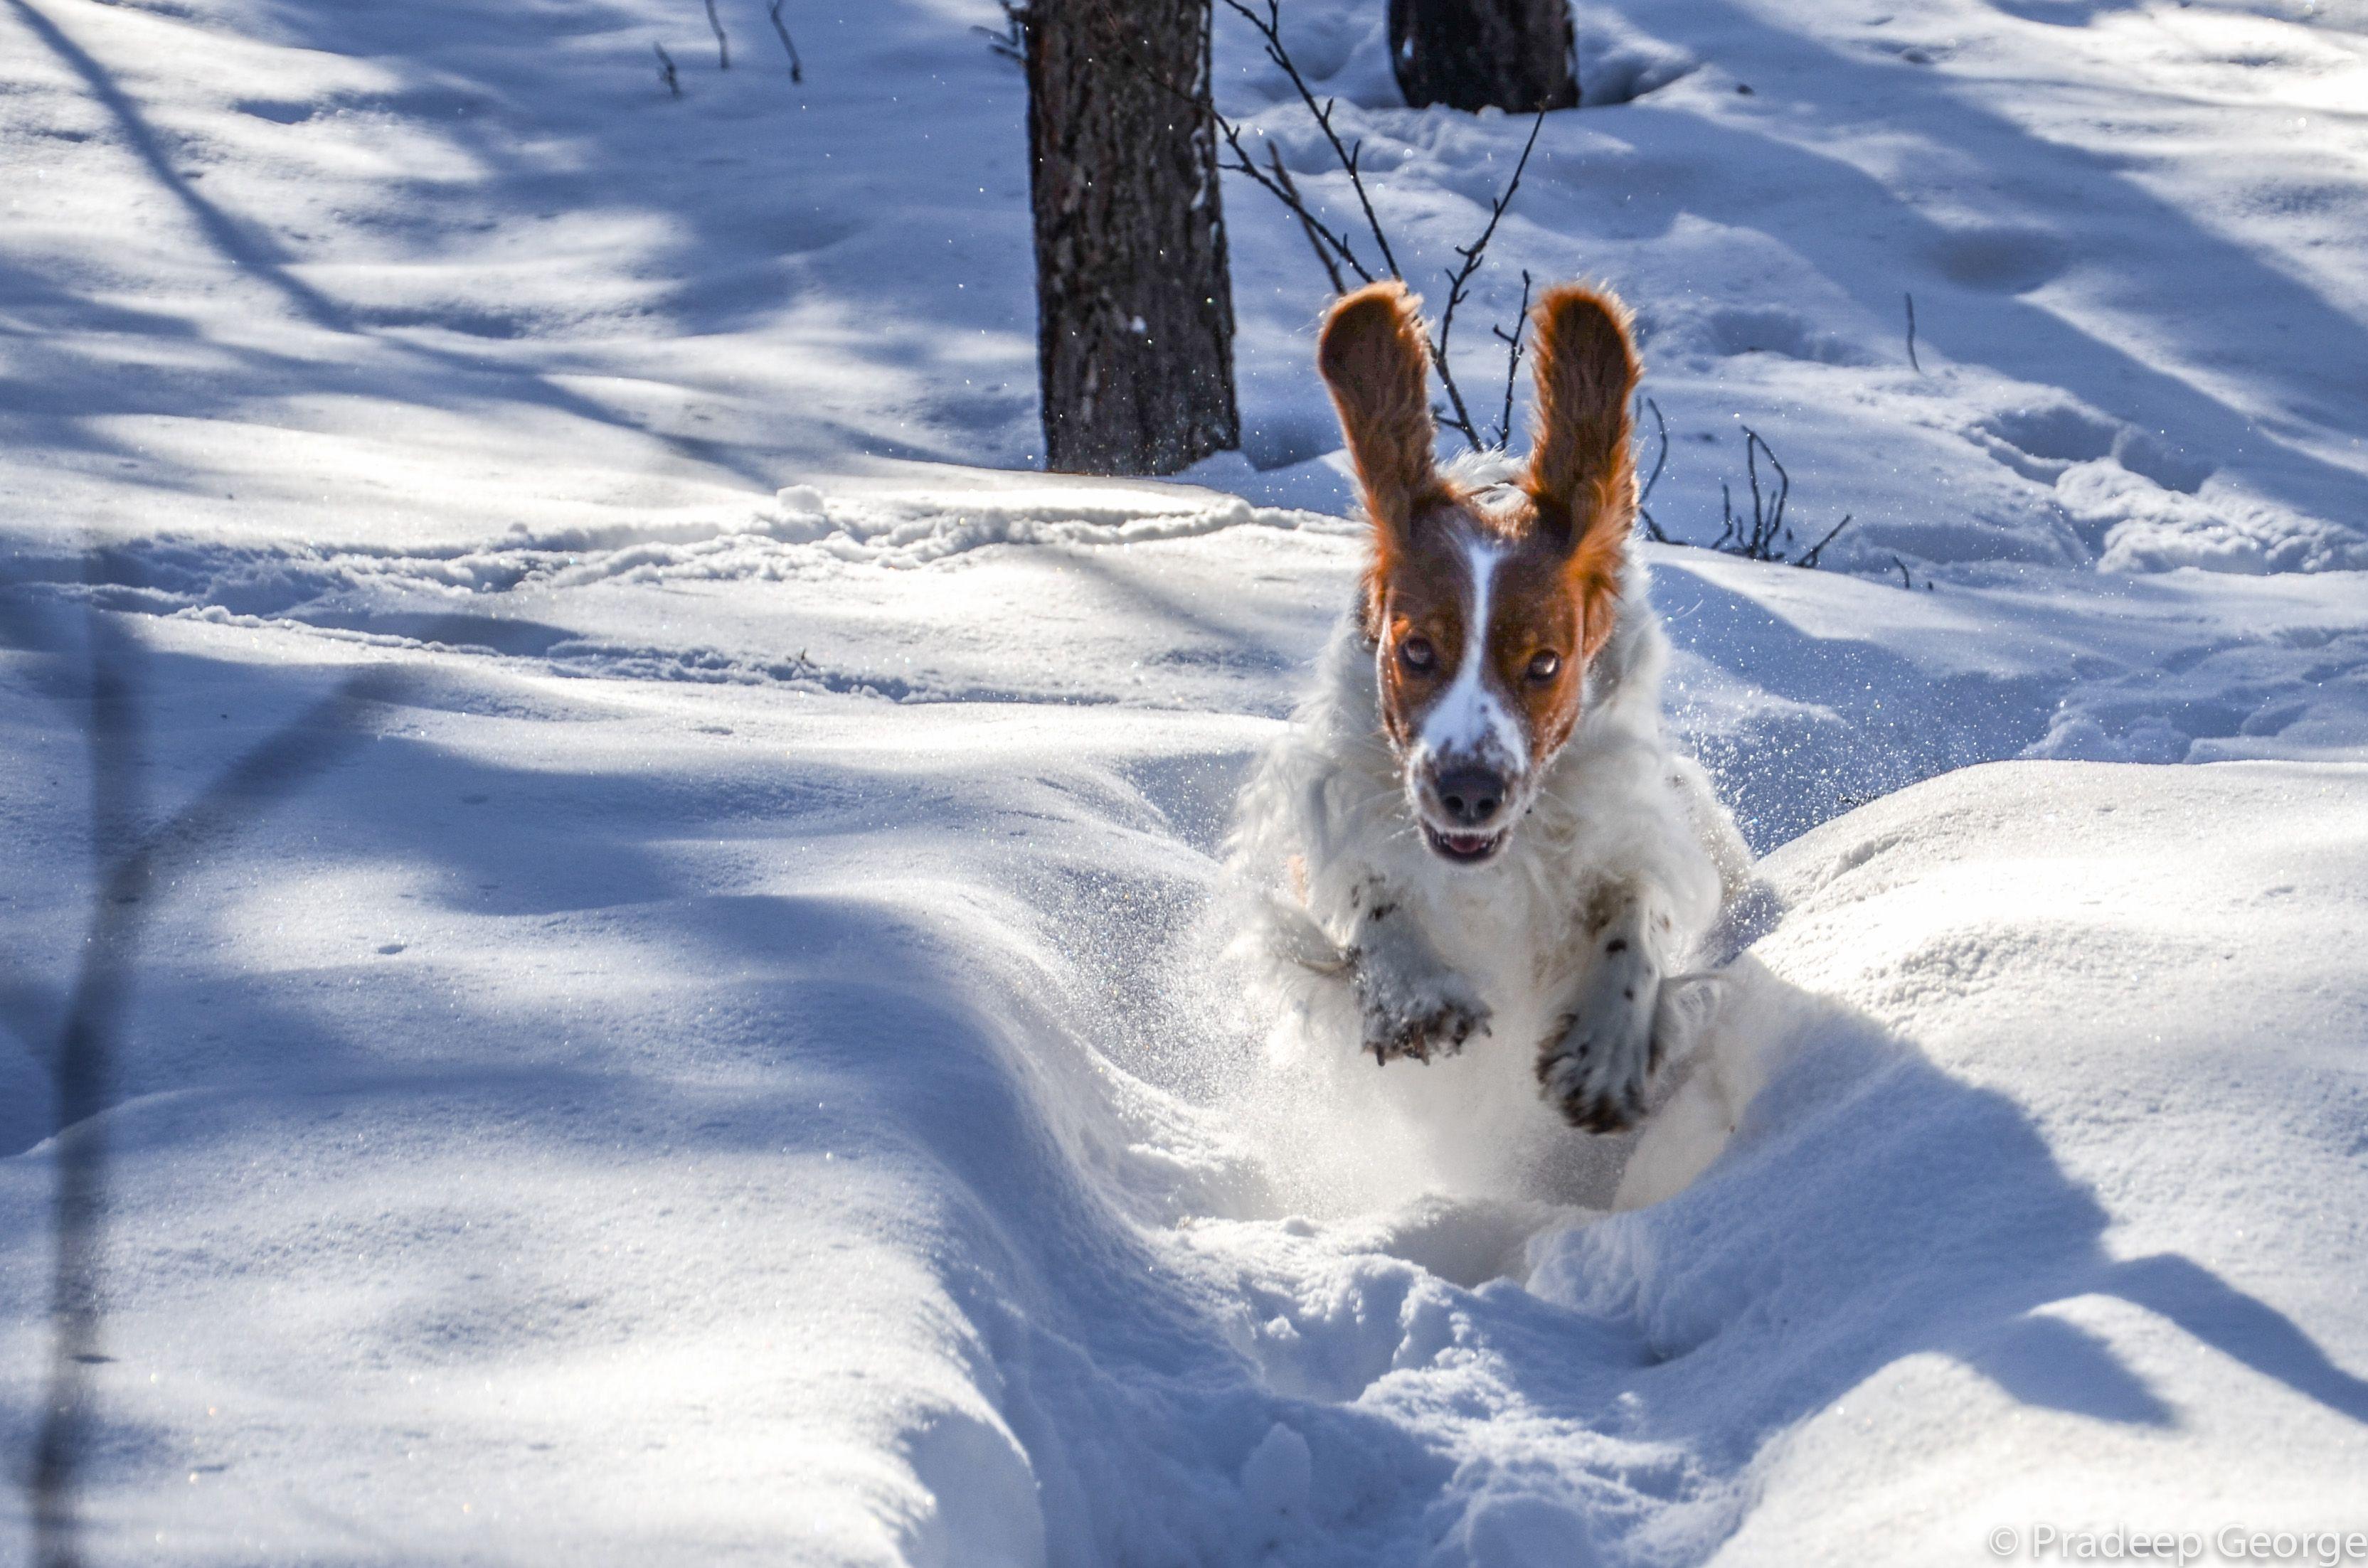 Welsh Springer Spaniel - Run like a wind!